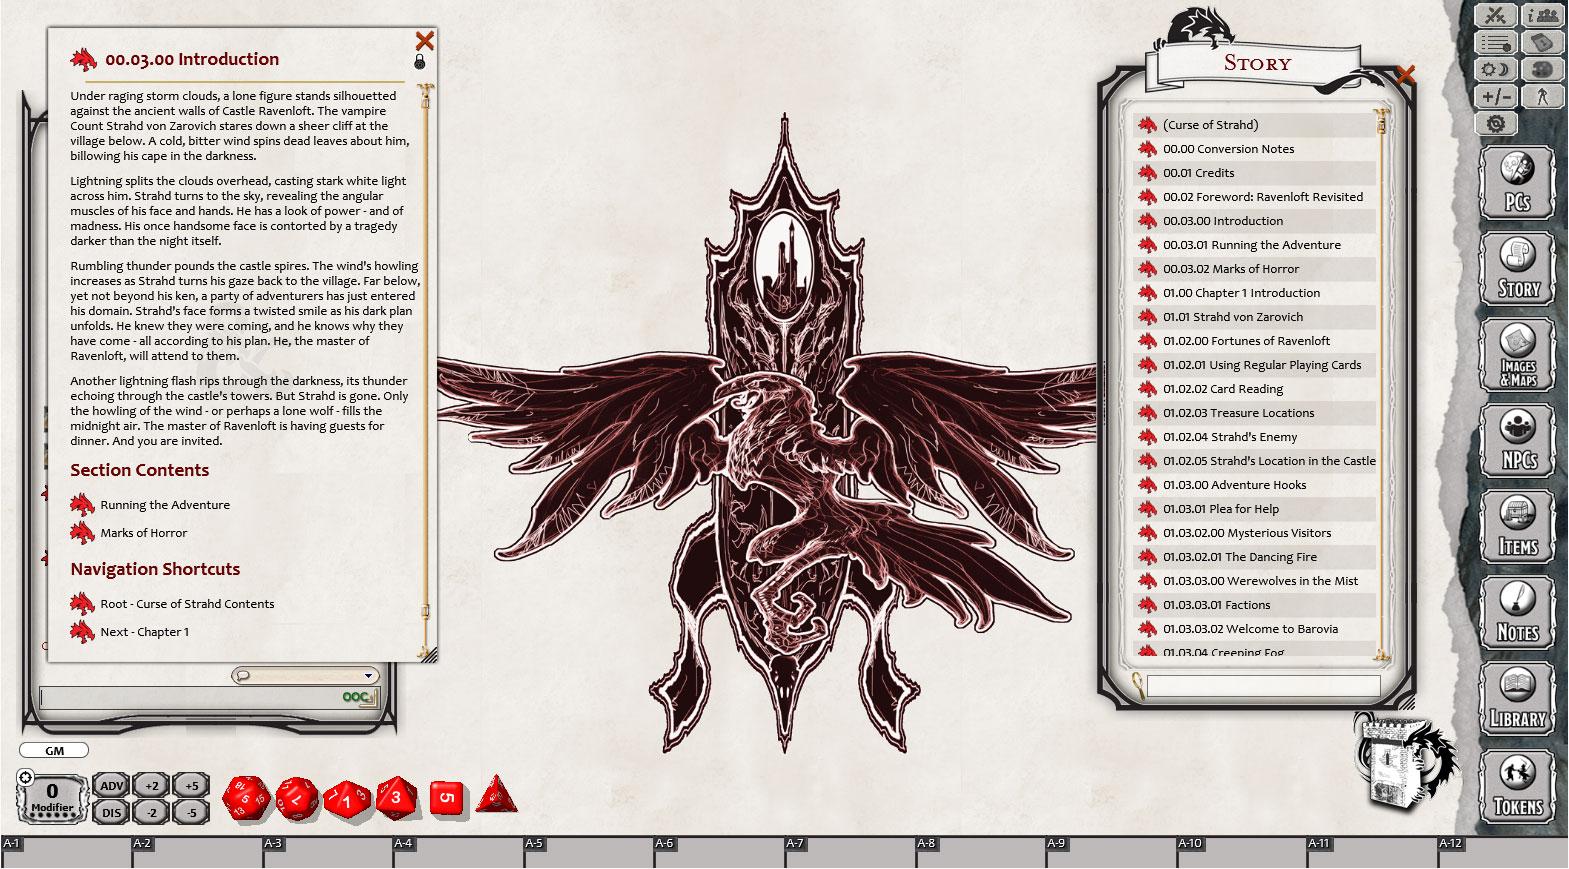 Fantasy Grounds - D&D Curse of Strahd